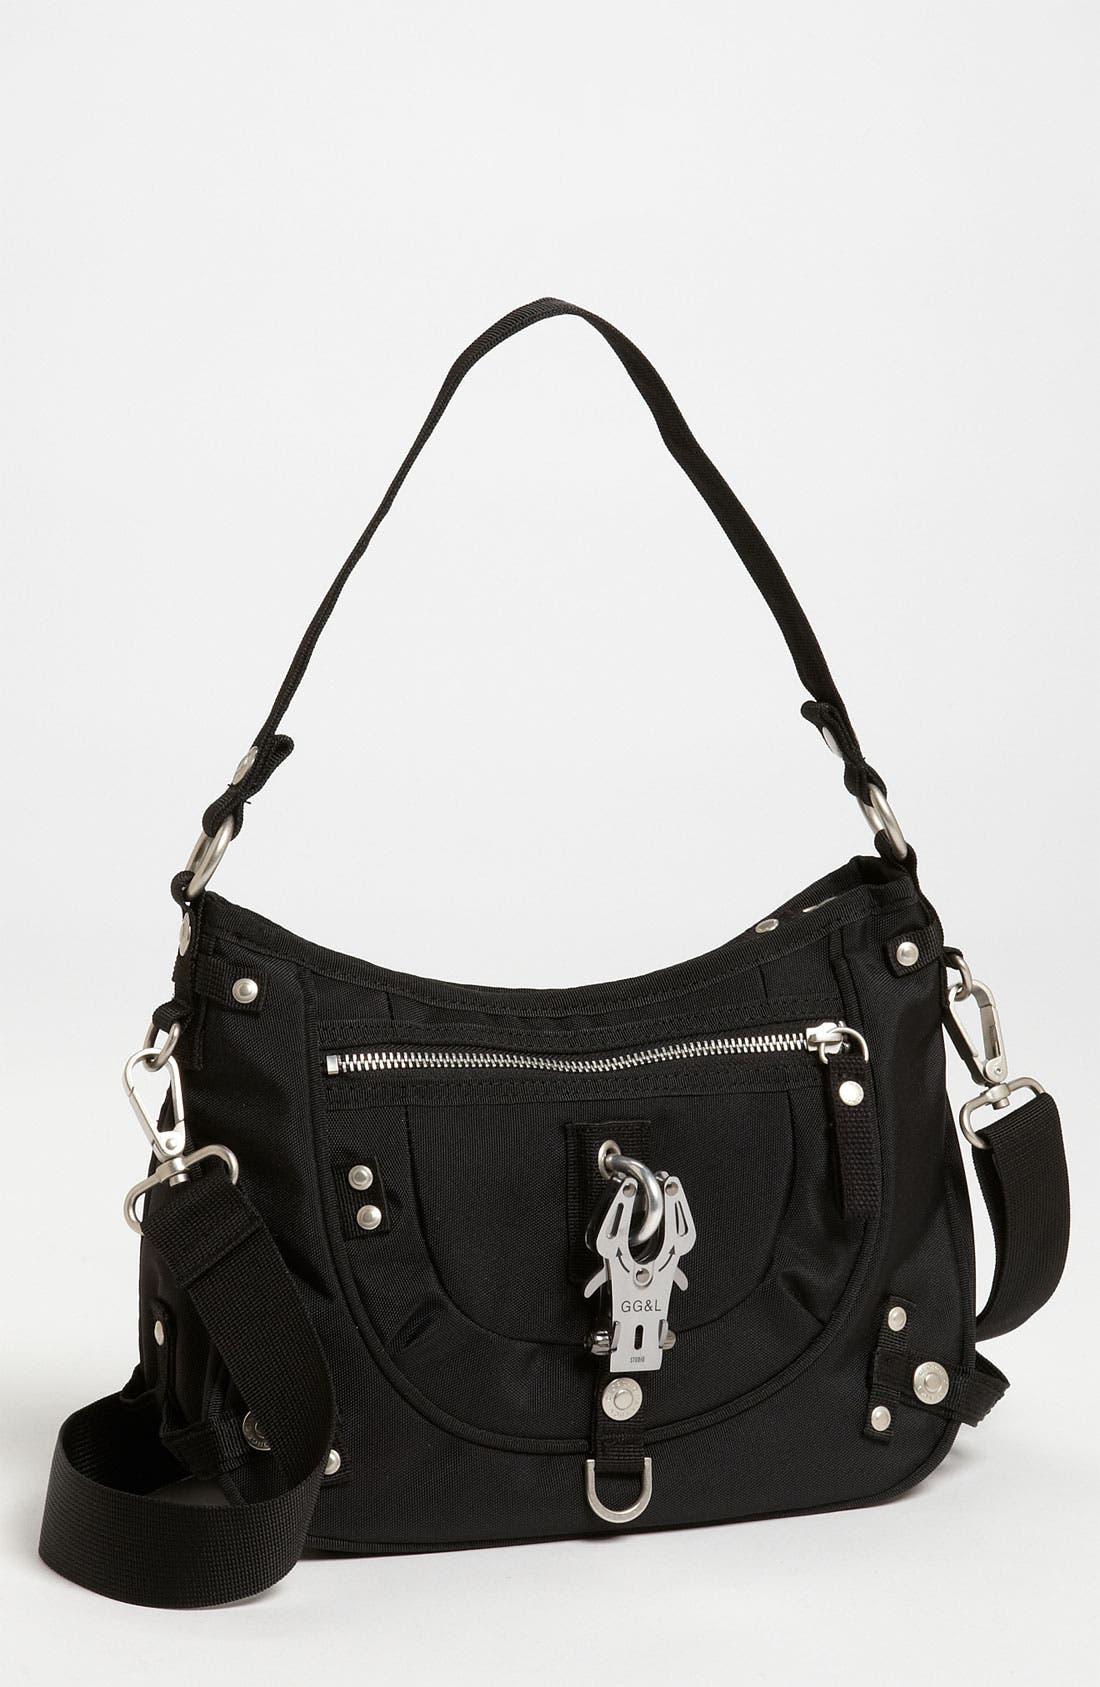 GEORGE GINA & LUCY 'Me Lalaland -  Mini' Shoulder Bag, Main, color, 001